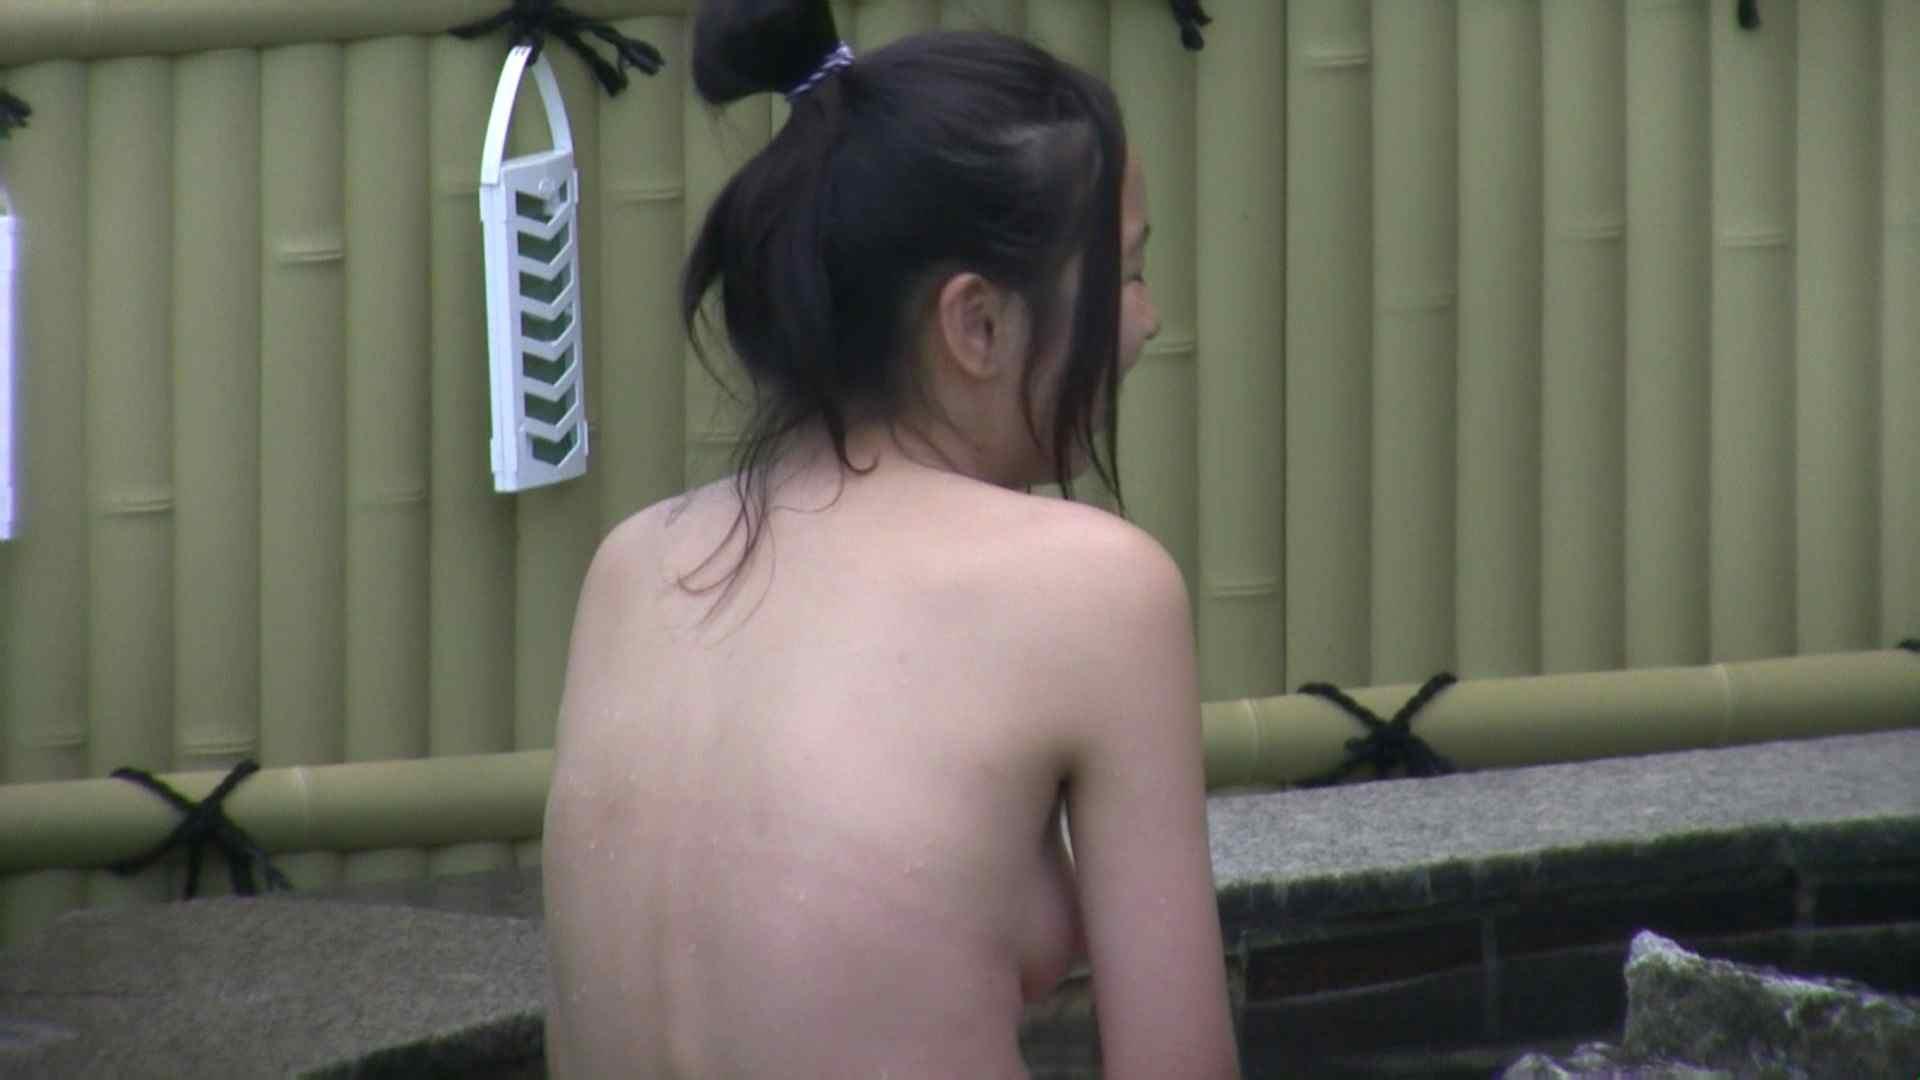 Aquaな露天風呂Vol.87【VIP限定】 盗撮 | HなOL  72pic 9